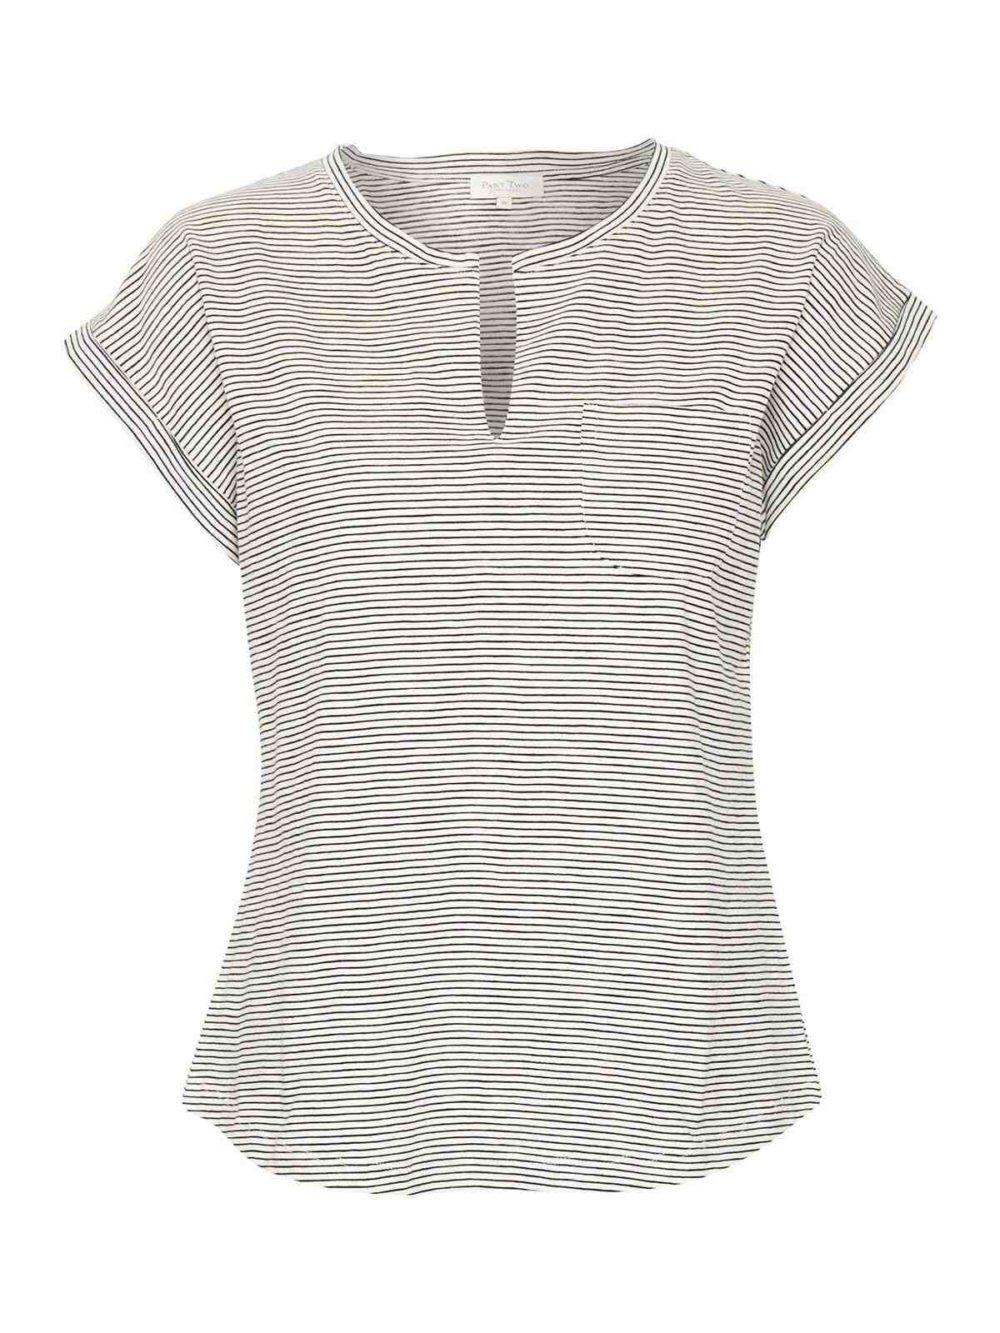 Kedita T-shirt Part Two Katie Kerr Women's Clothing